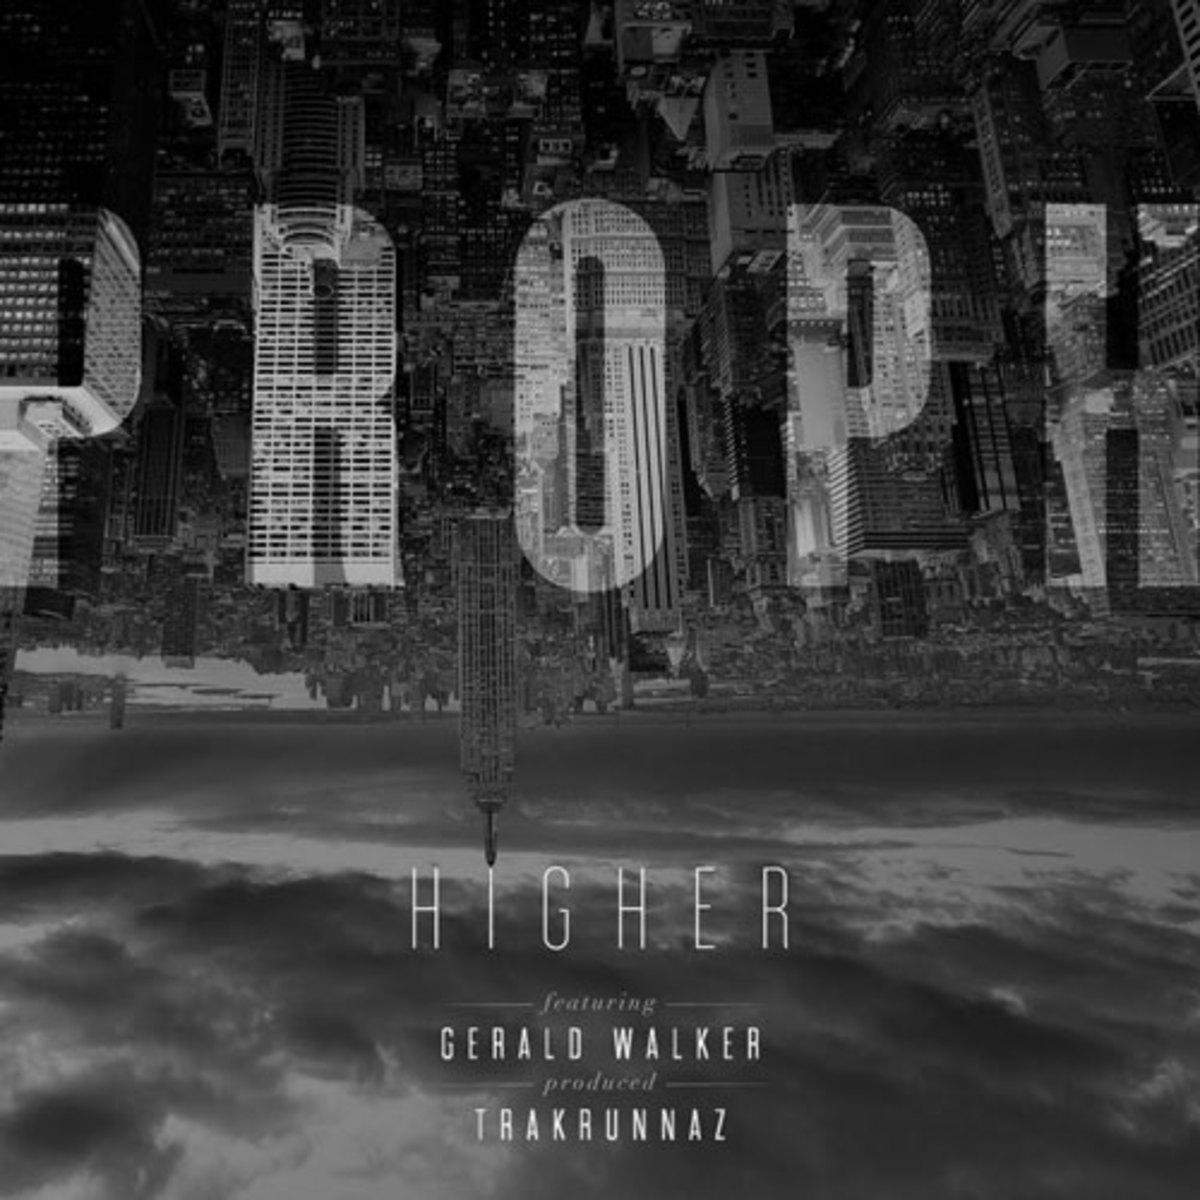 proph-higher.jpg